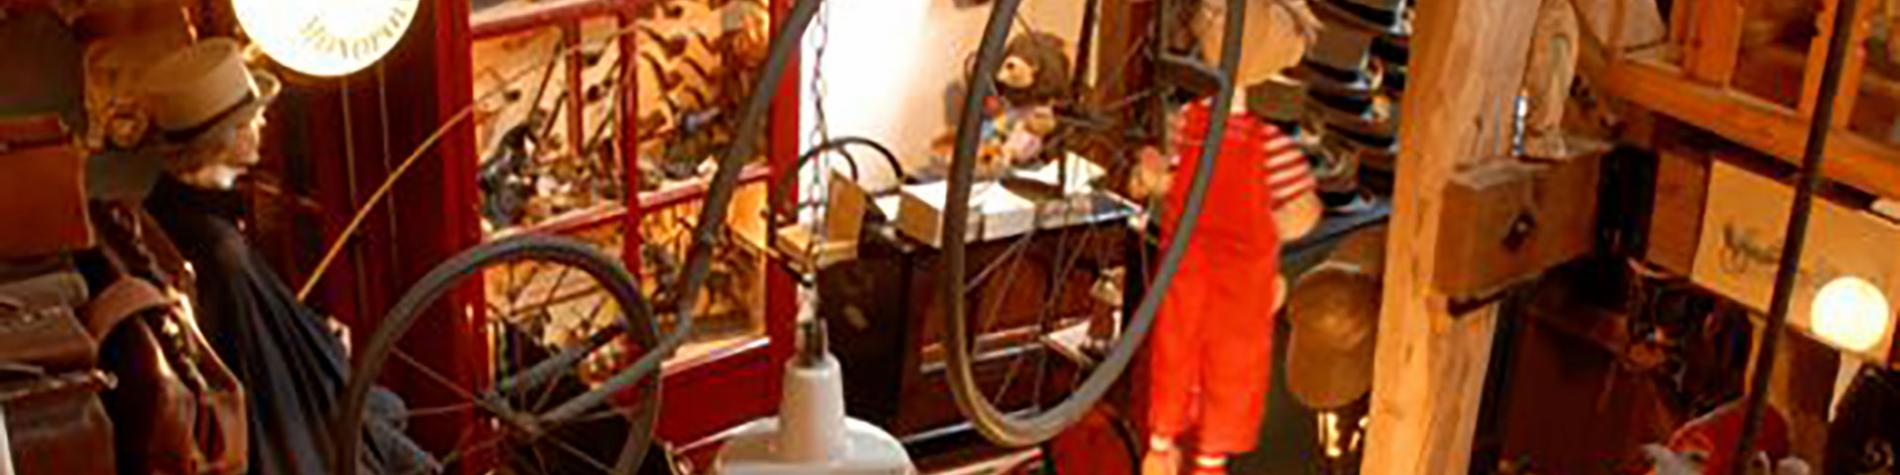 Musée Monopoli - Wallonie insolite